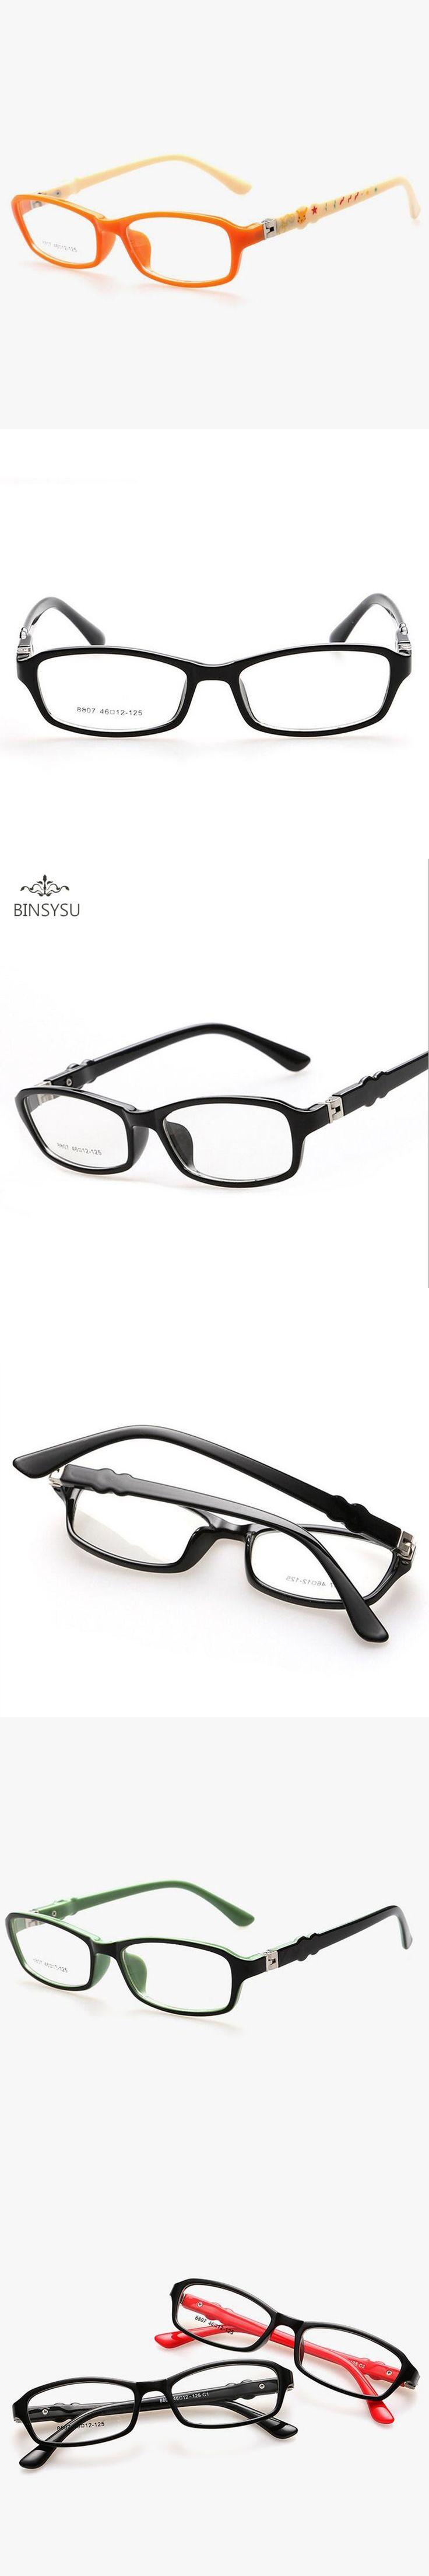 Fashion New Children Prescription lens Eyeglasses Frame Kids Flat Lenses Spectacles Spring hinge Oculos Myopia frames 8807